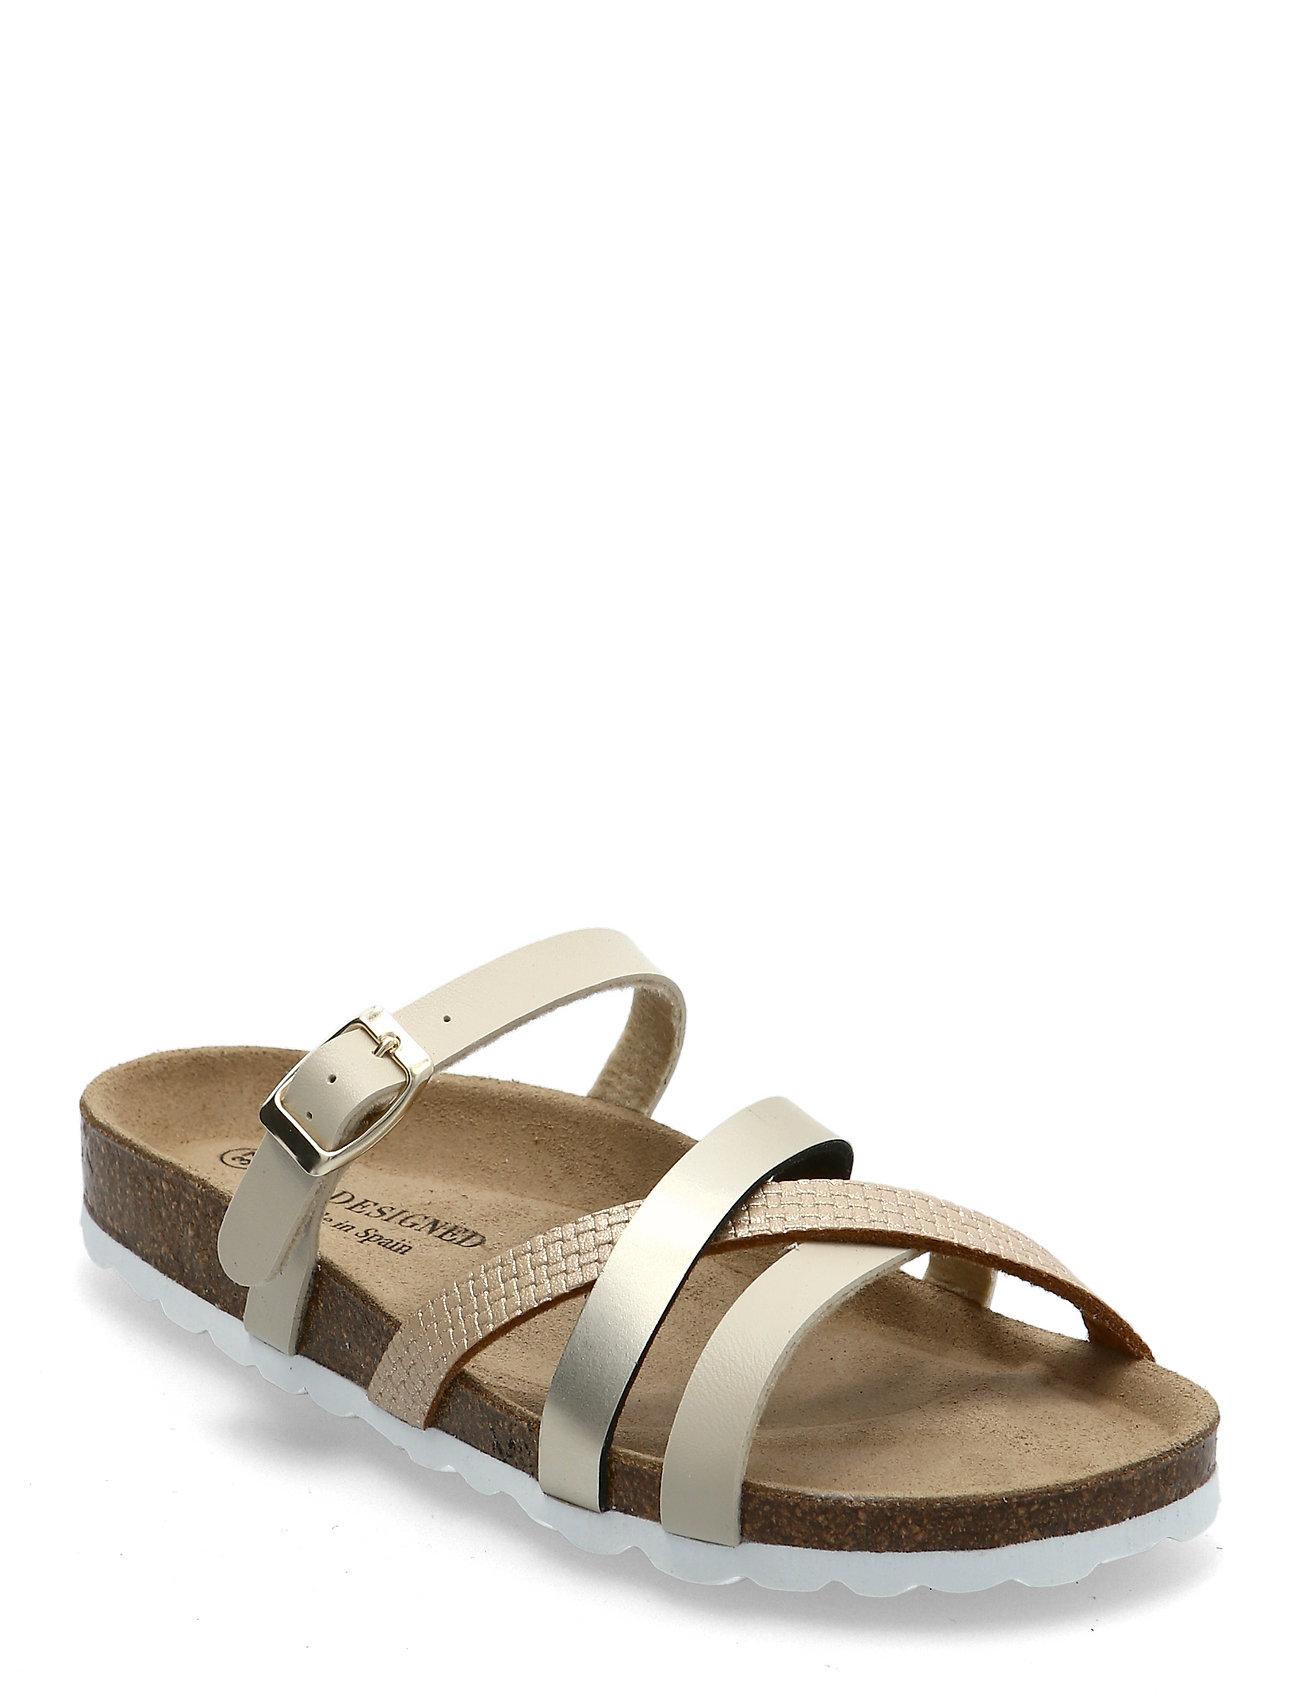 Image of Eshita21 Shoes Summer Shoes Flat Sandals Guld RE:DESIGNED EST 2003 (3515473667)